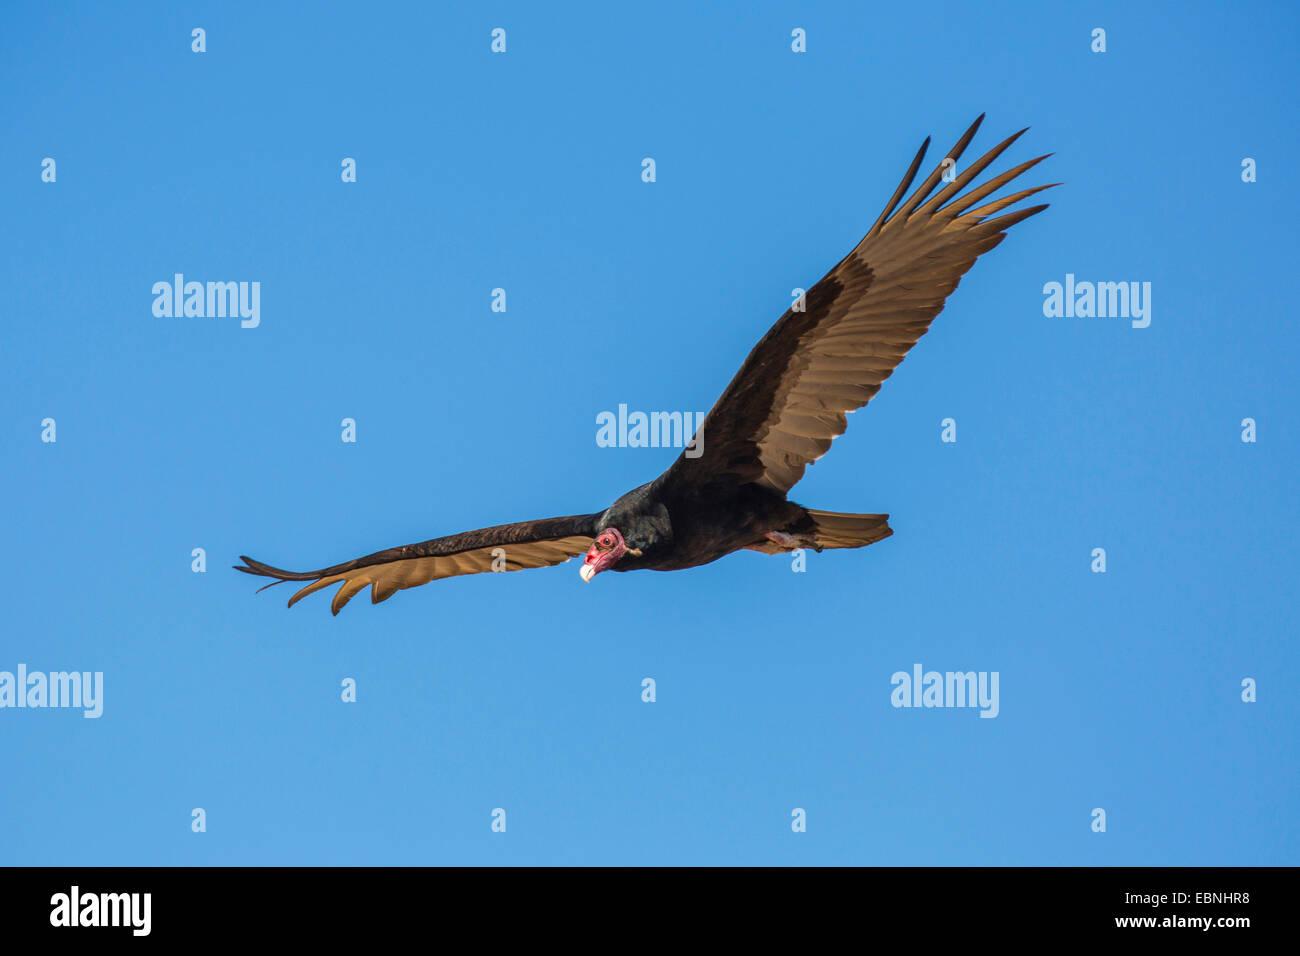 turkey vulture (Cathartes aura), gliding, USA, Arizona, Sonoran - Stock Image